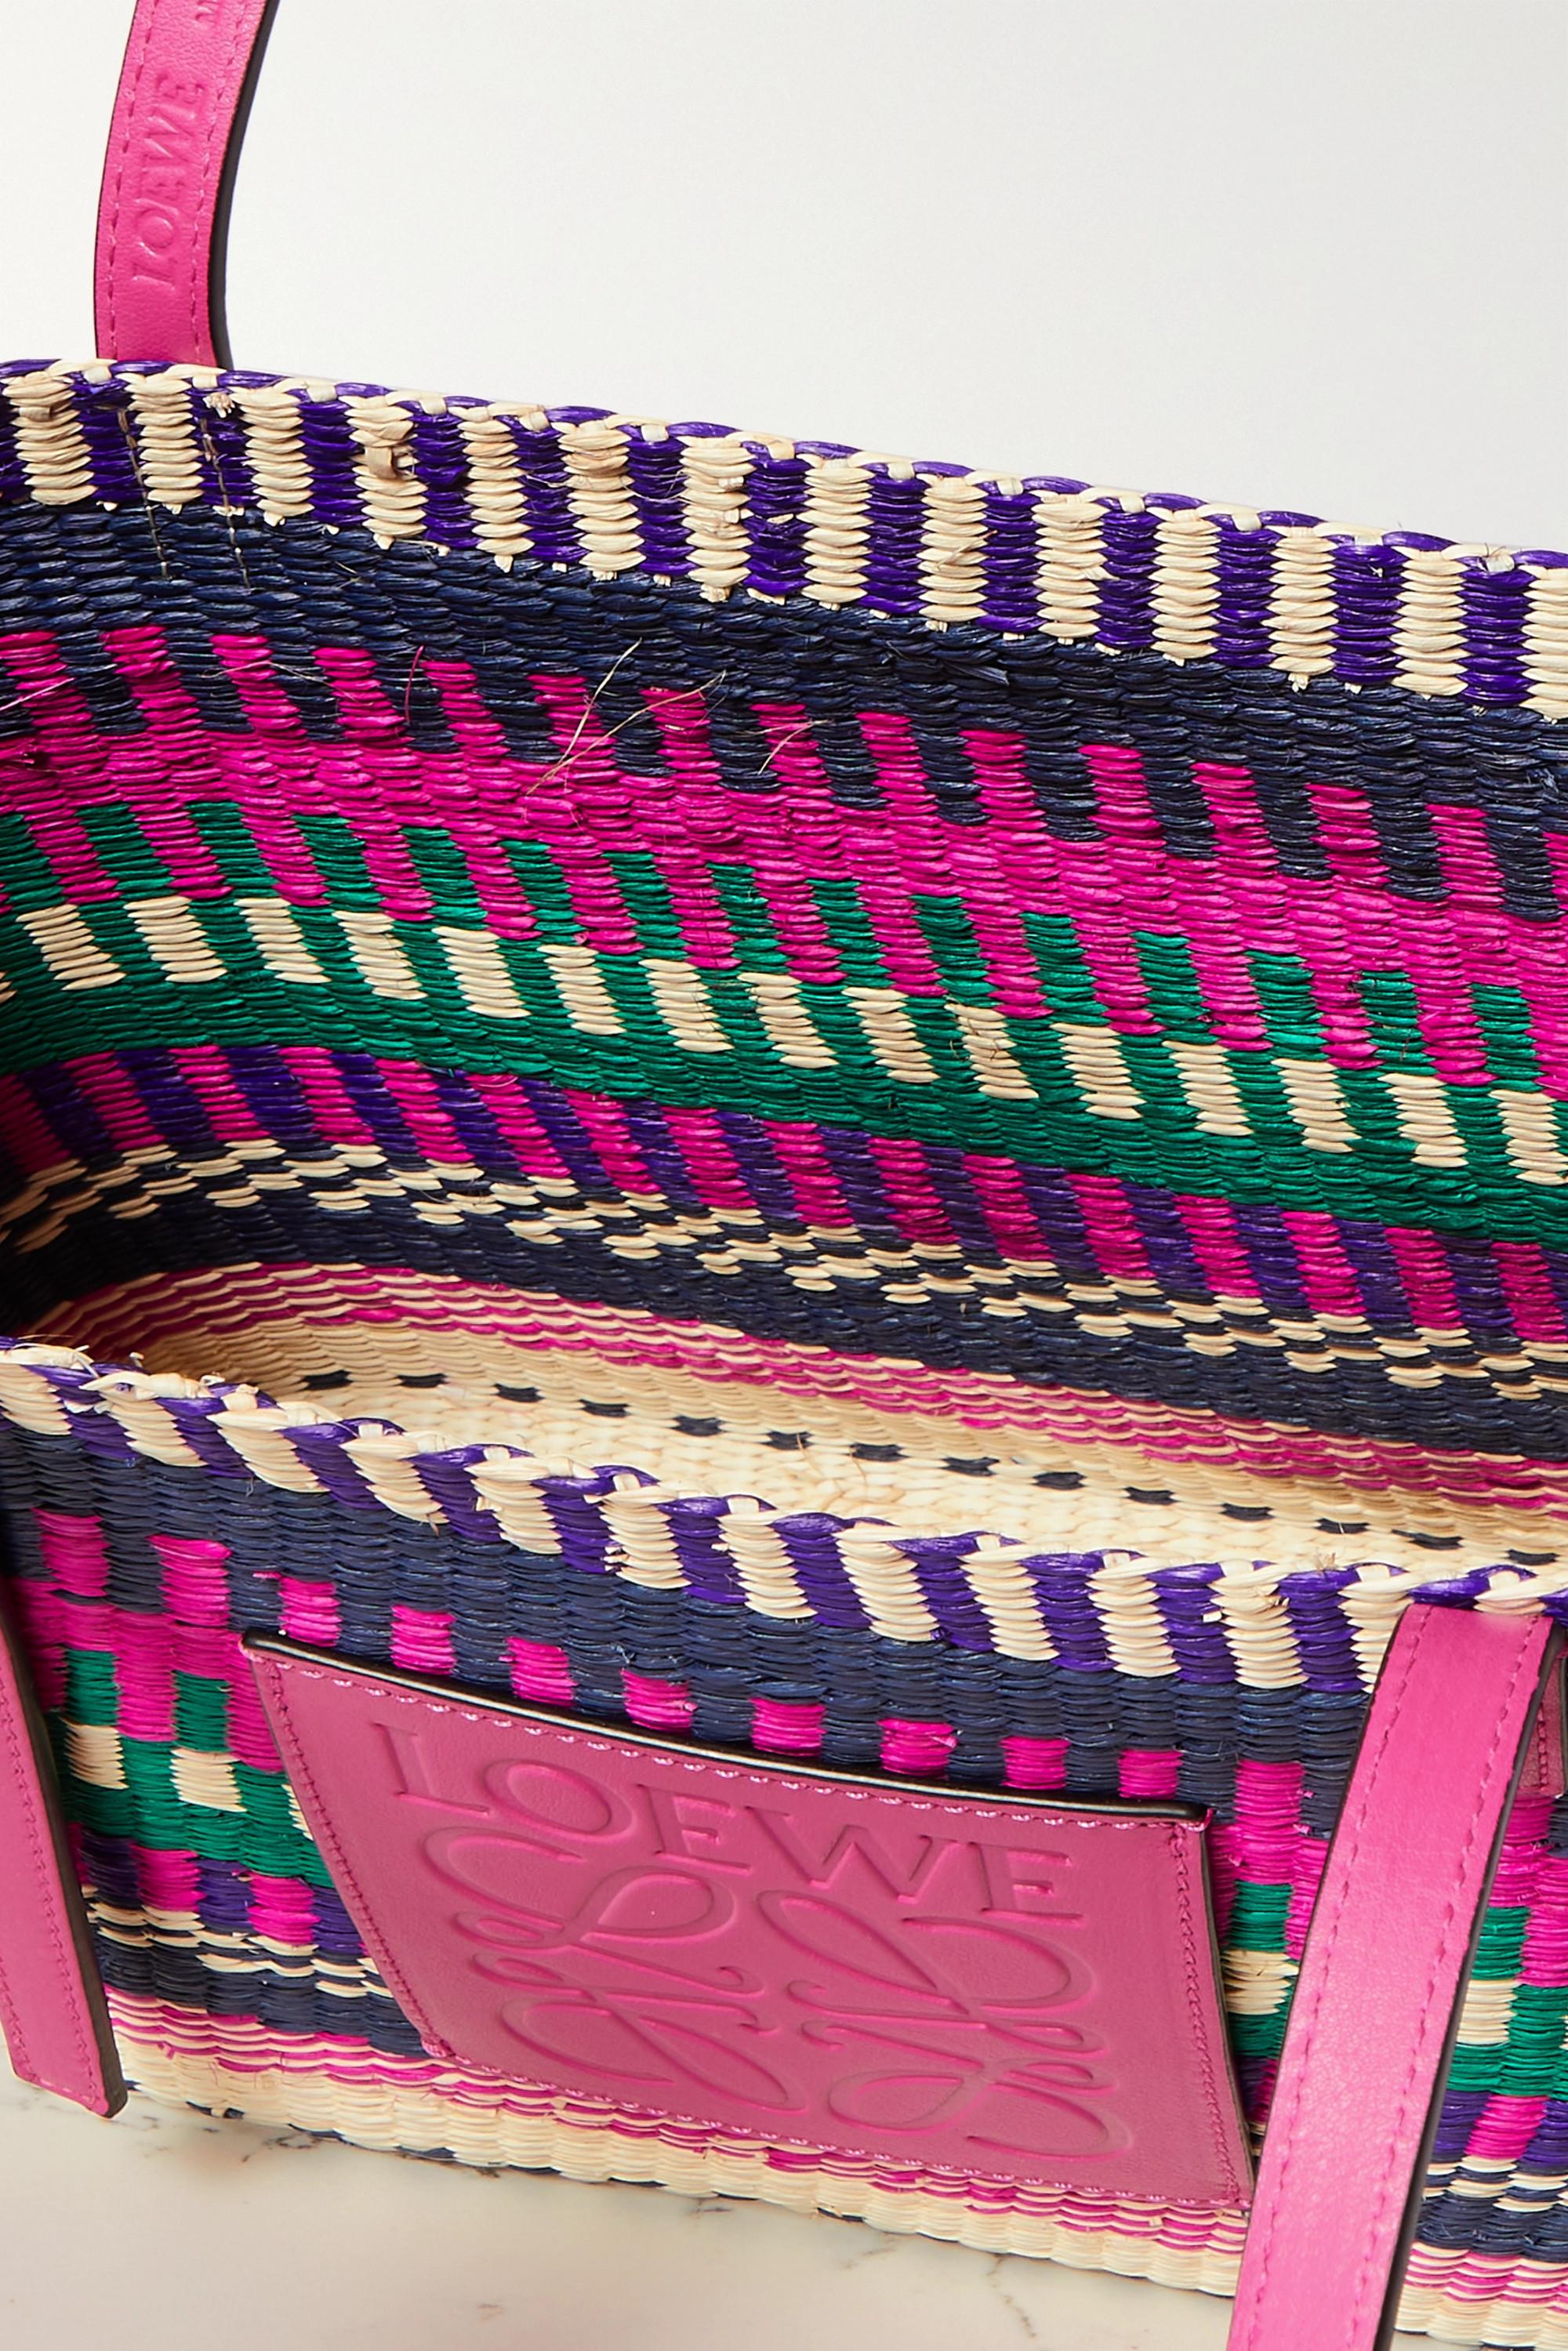 Loewe + Paula's Ibiza Square Basket leather-trimmed woven raffia tote